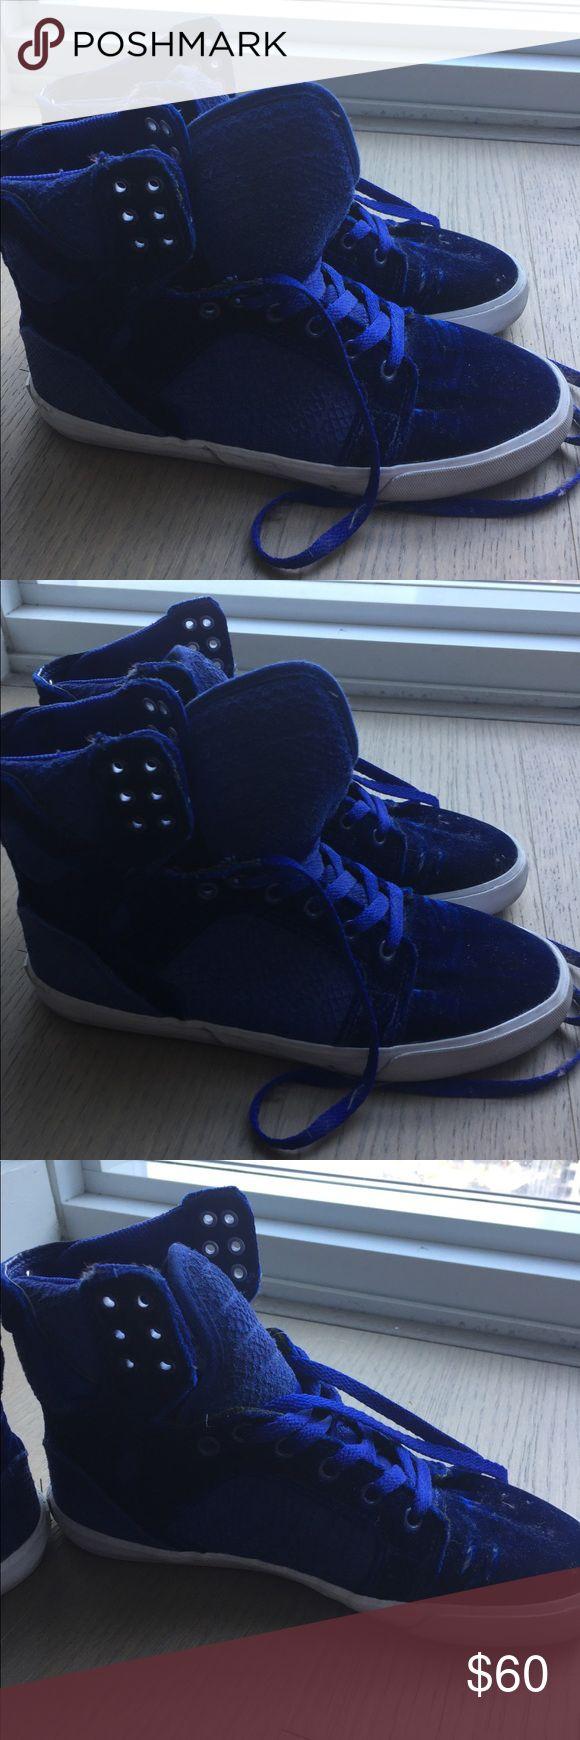 Supra high tops (cobalt blue velvet) Cobalt blue velvet high tops Supra Shoes Sneakers